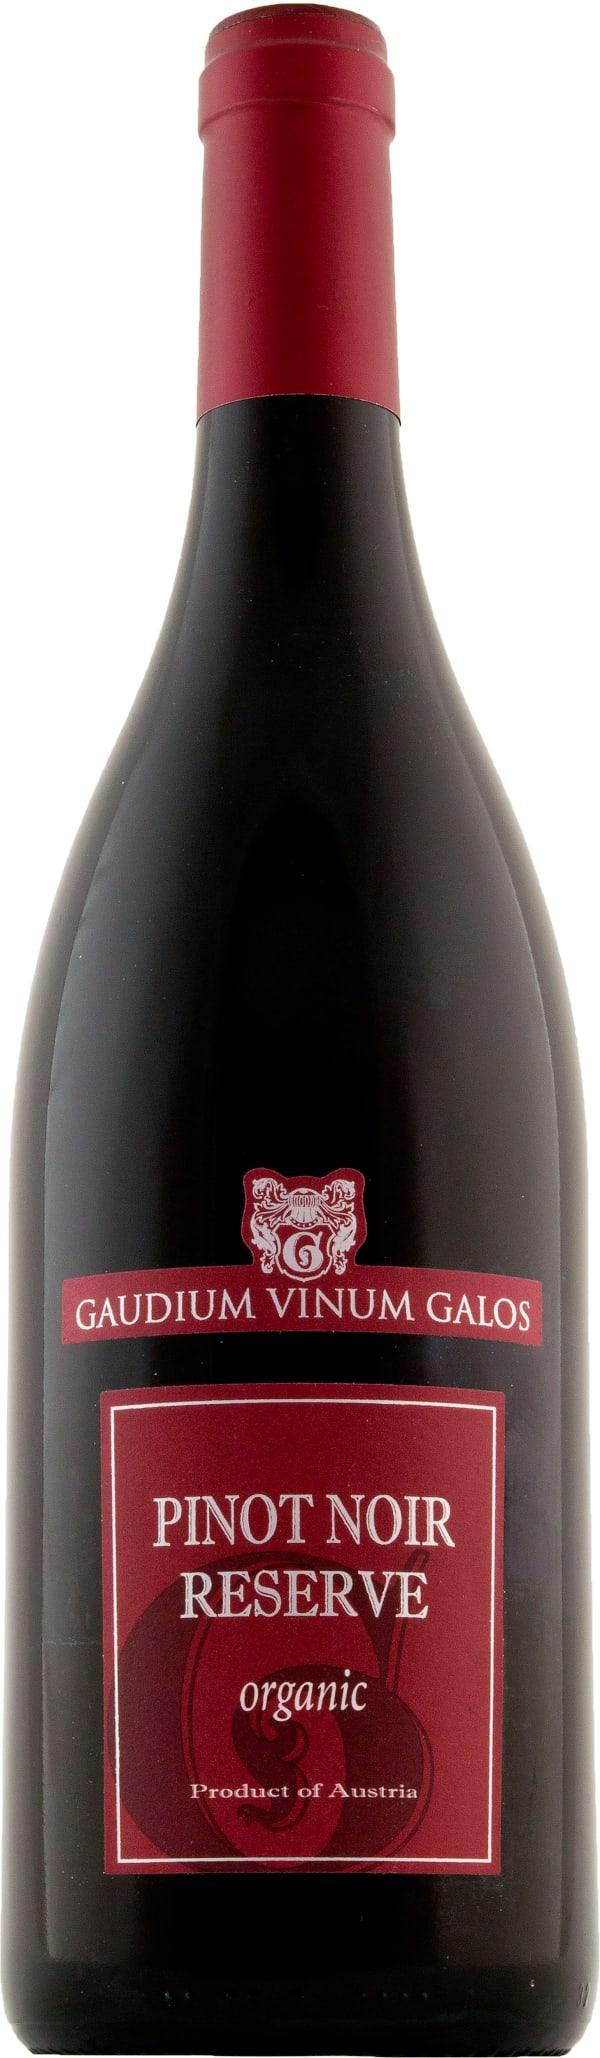 Gaudium Vinum Galos Pinot Noir Reserve Organic 2016